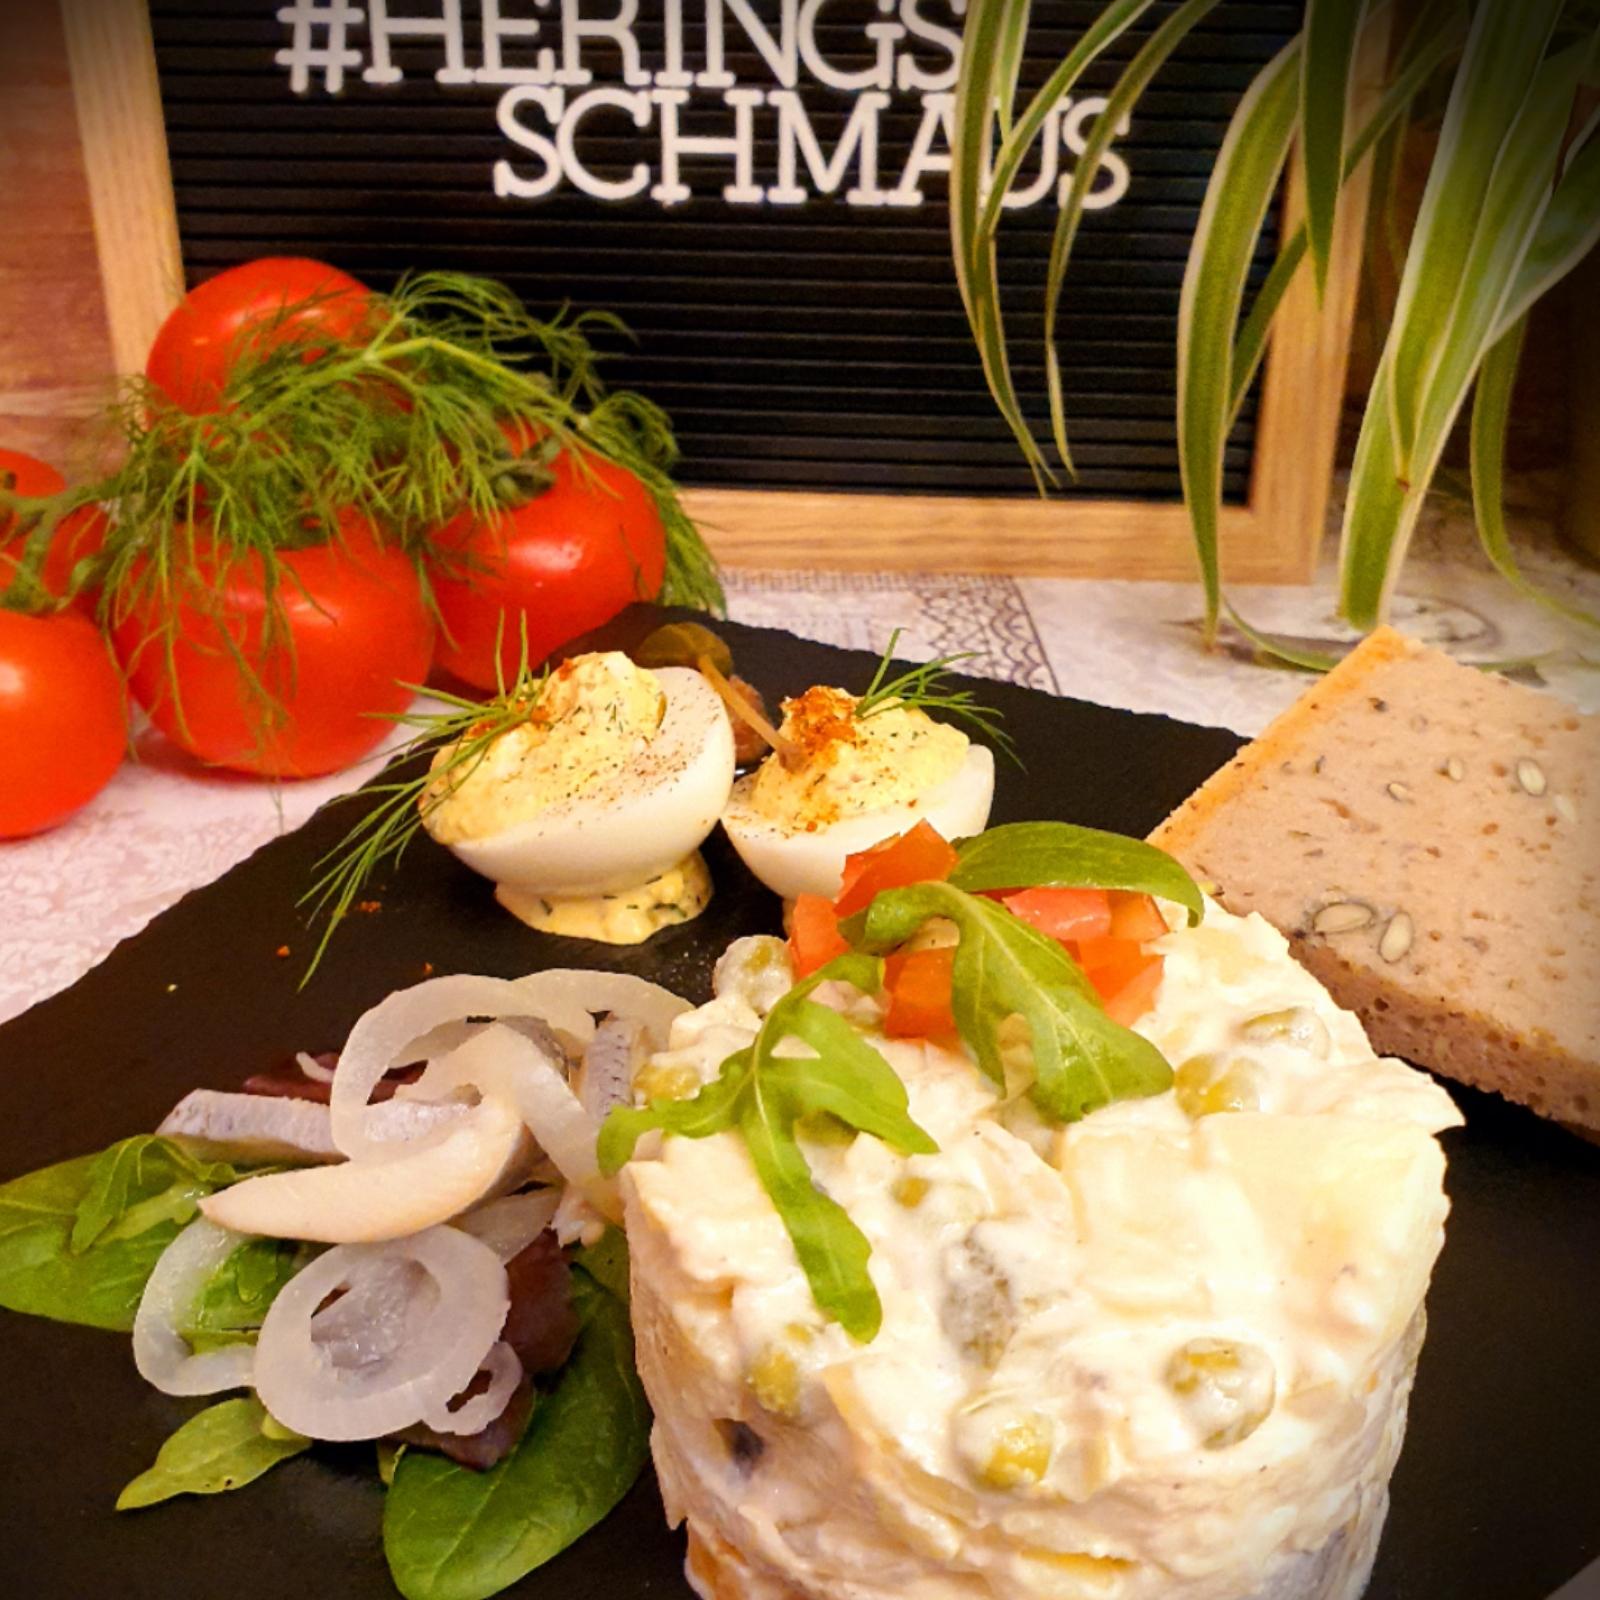 "Heringsschmaus - Spezialithek Heringssalat ""Hausfrauen Art"""